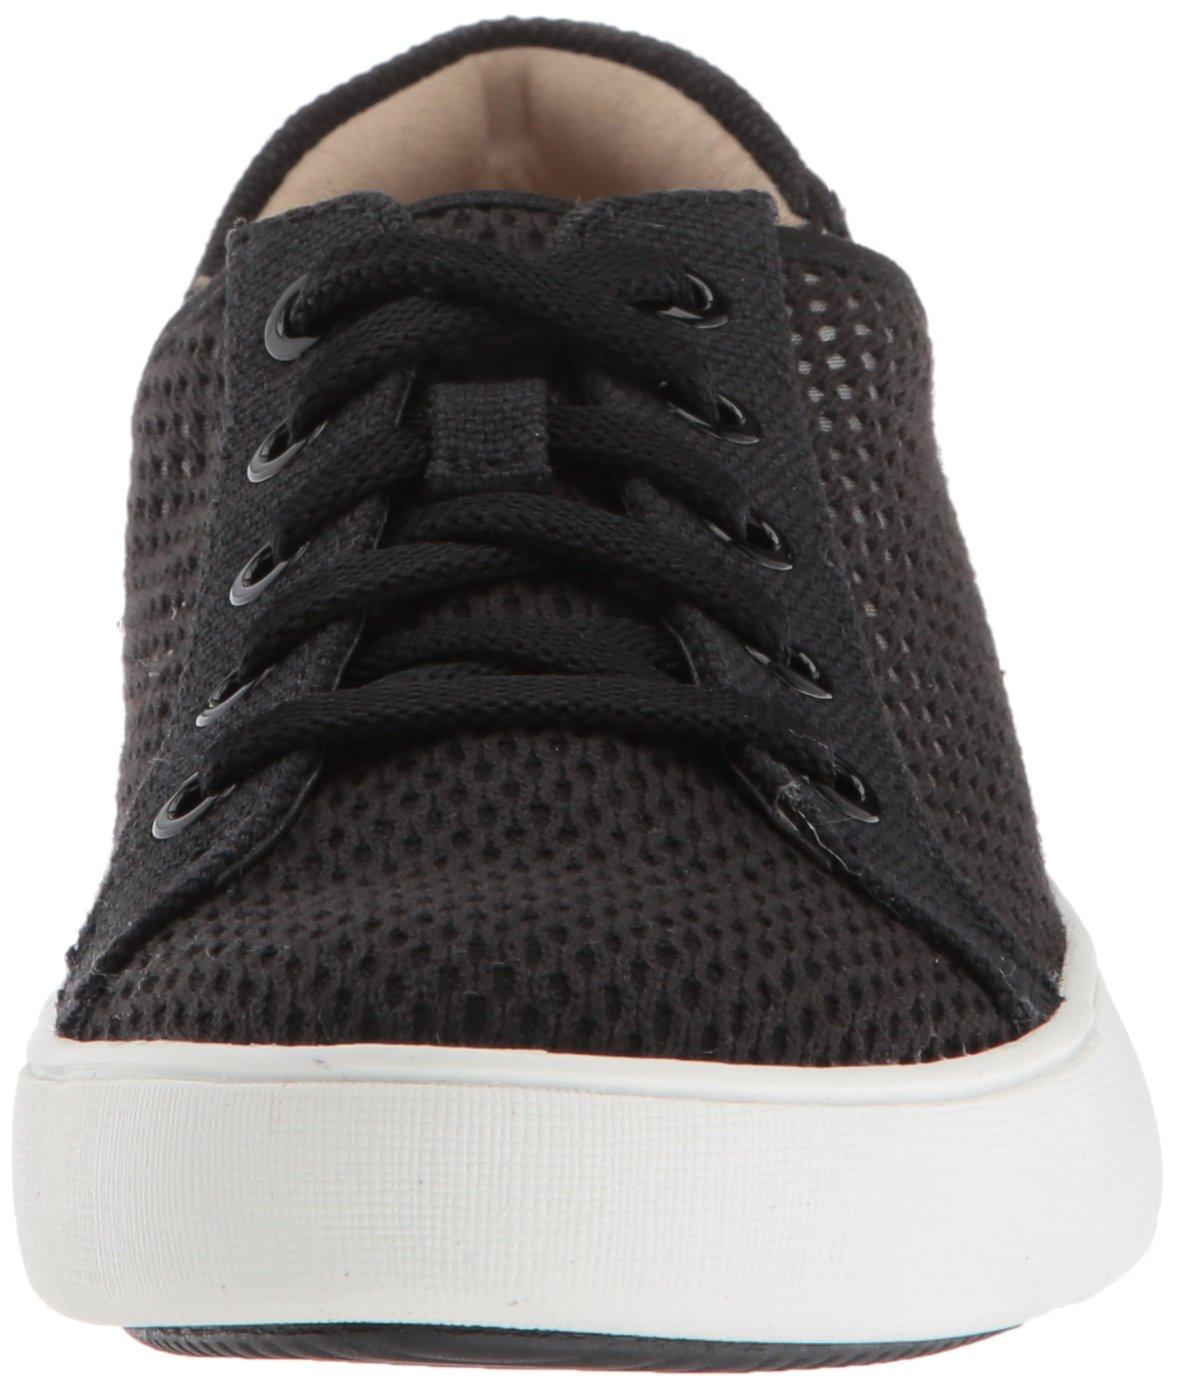 Naturalizer Women's Morrison 3 Sneaker B077C9X278 9 N US Black